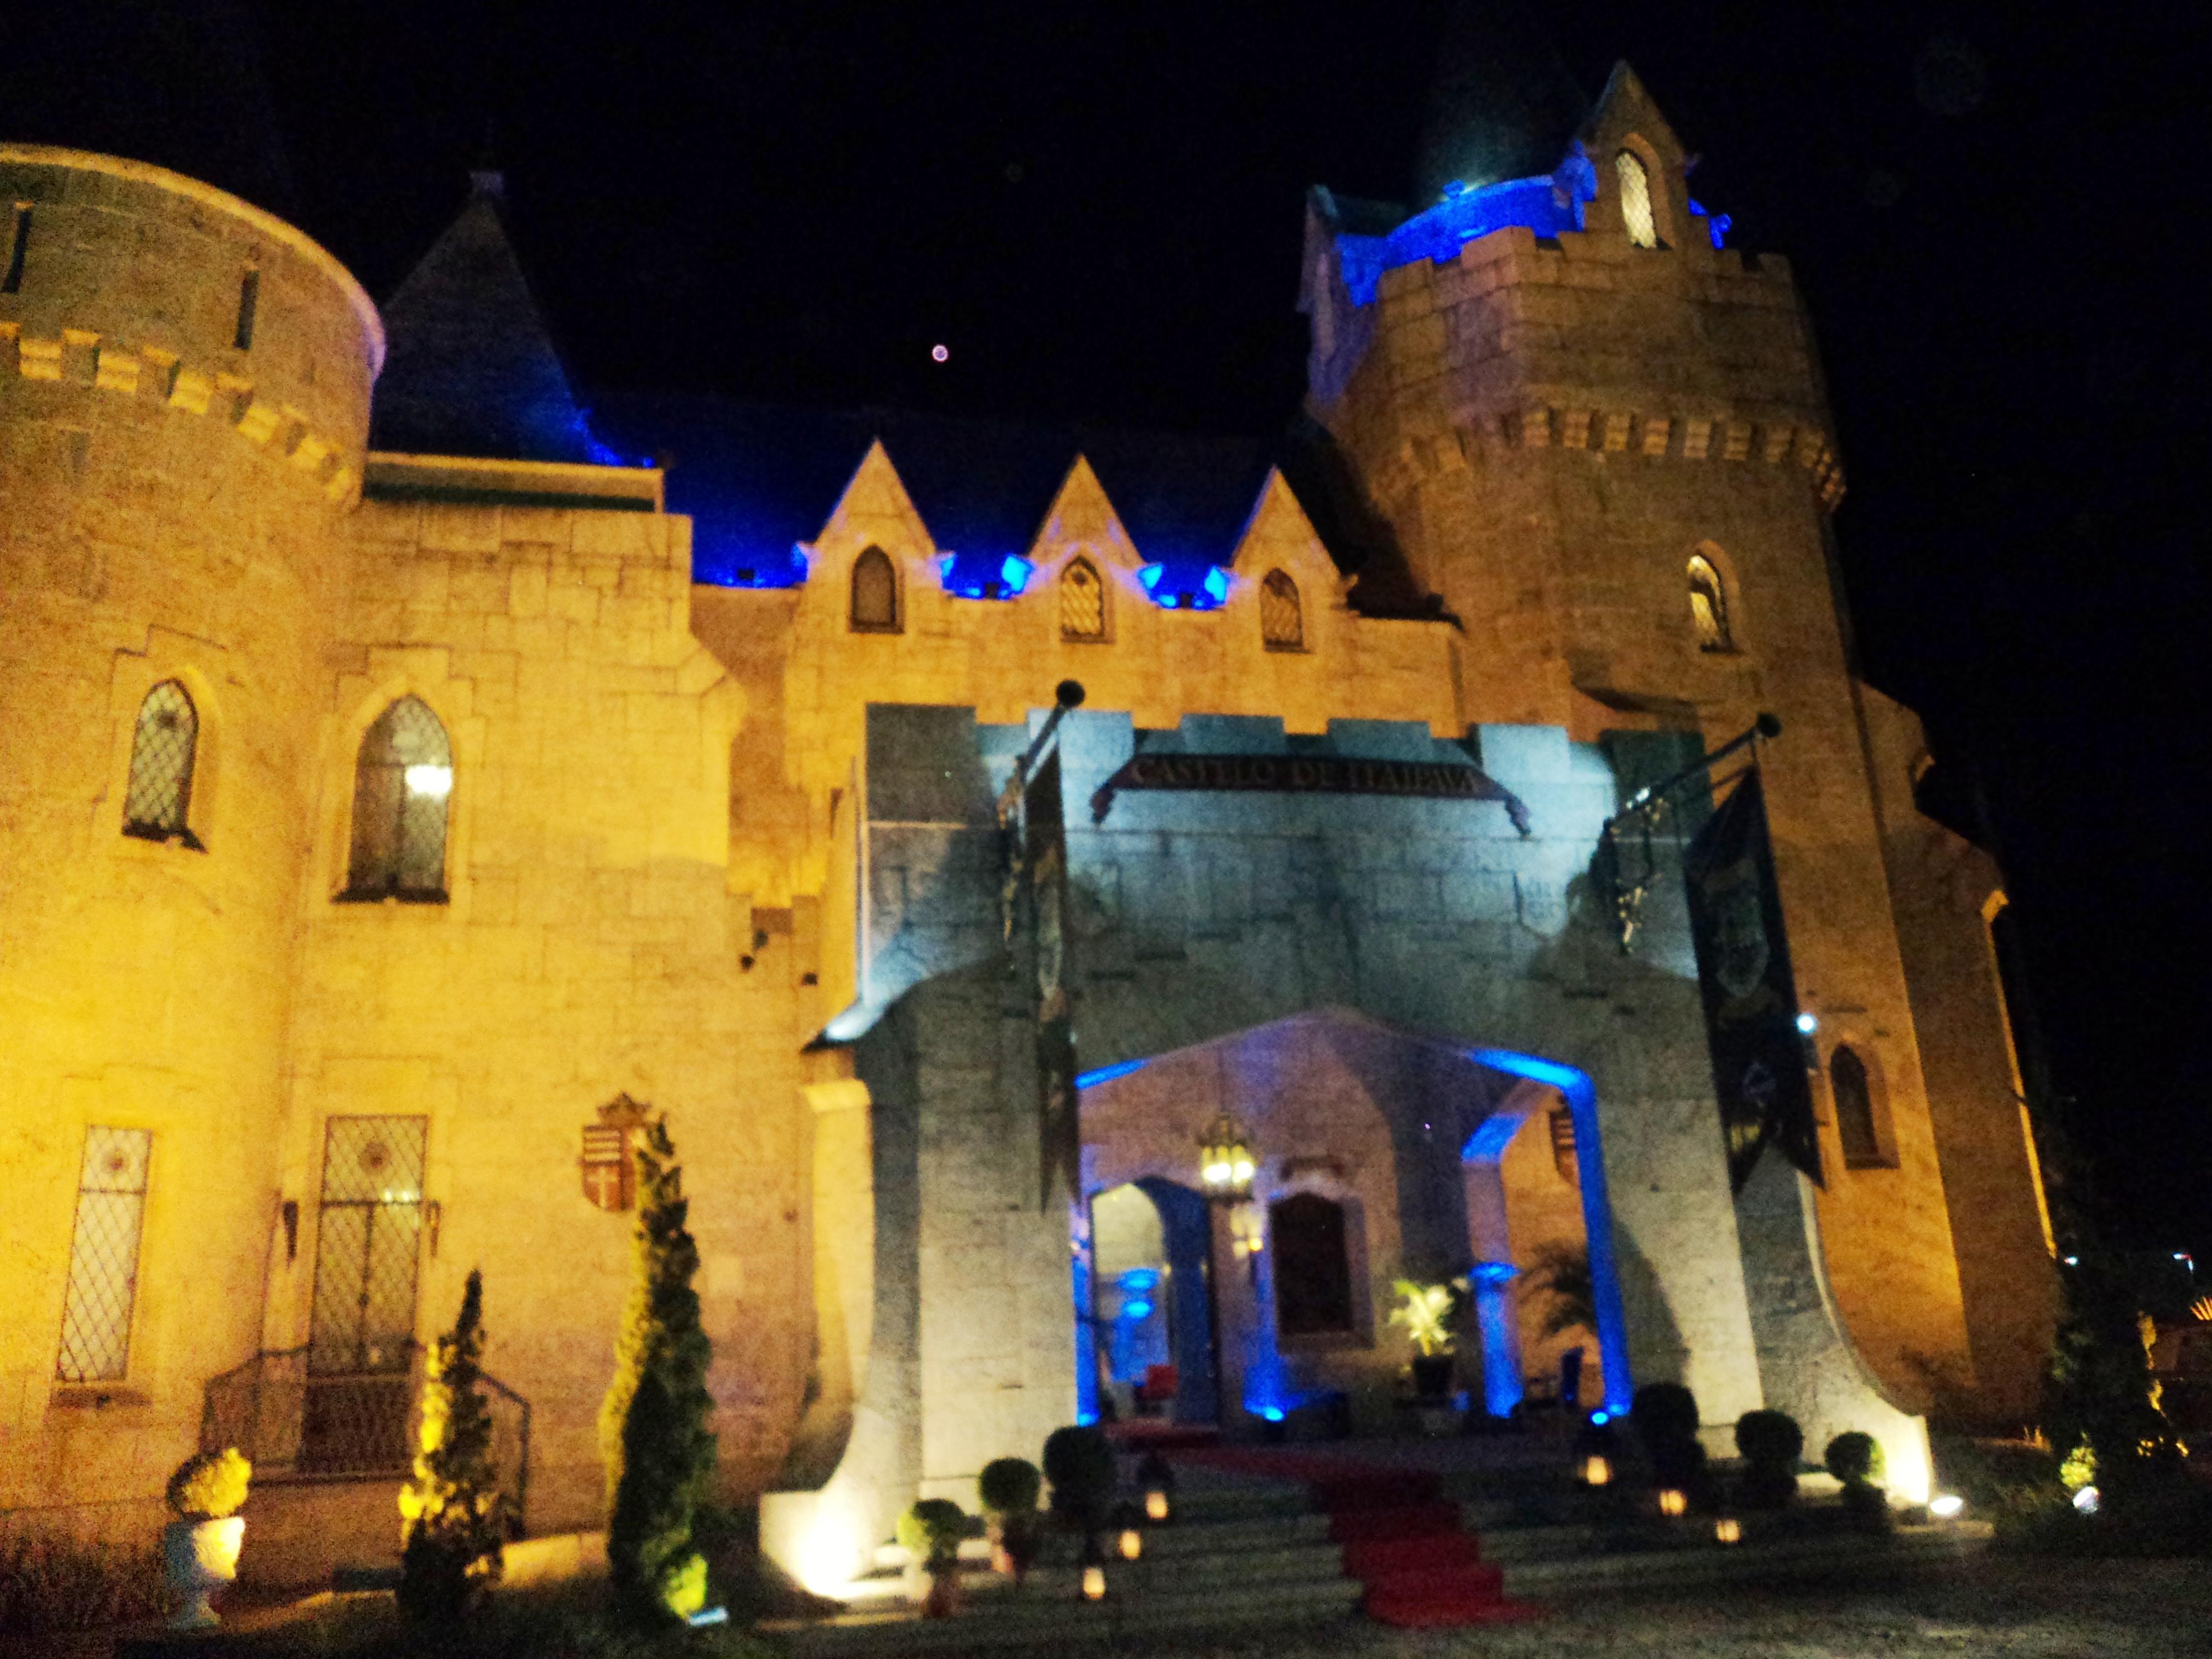 foto da fachada do Castelo de Itaipava, 20.7.14